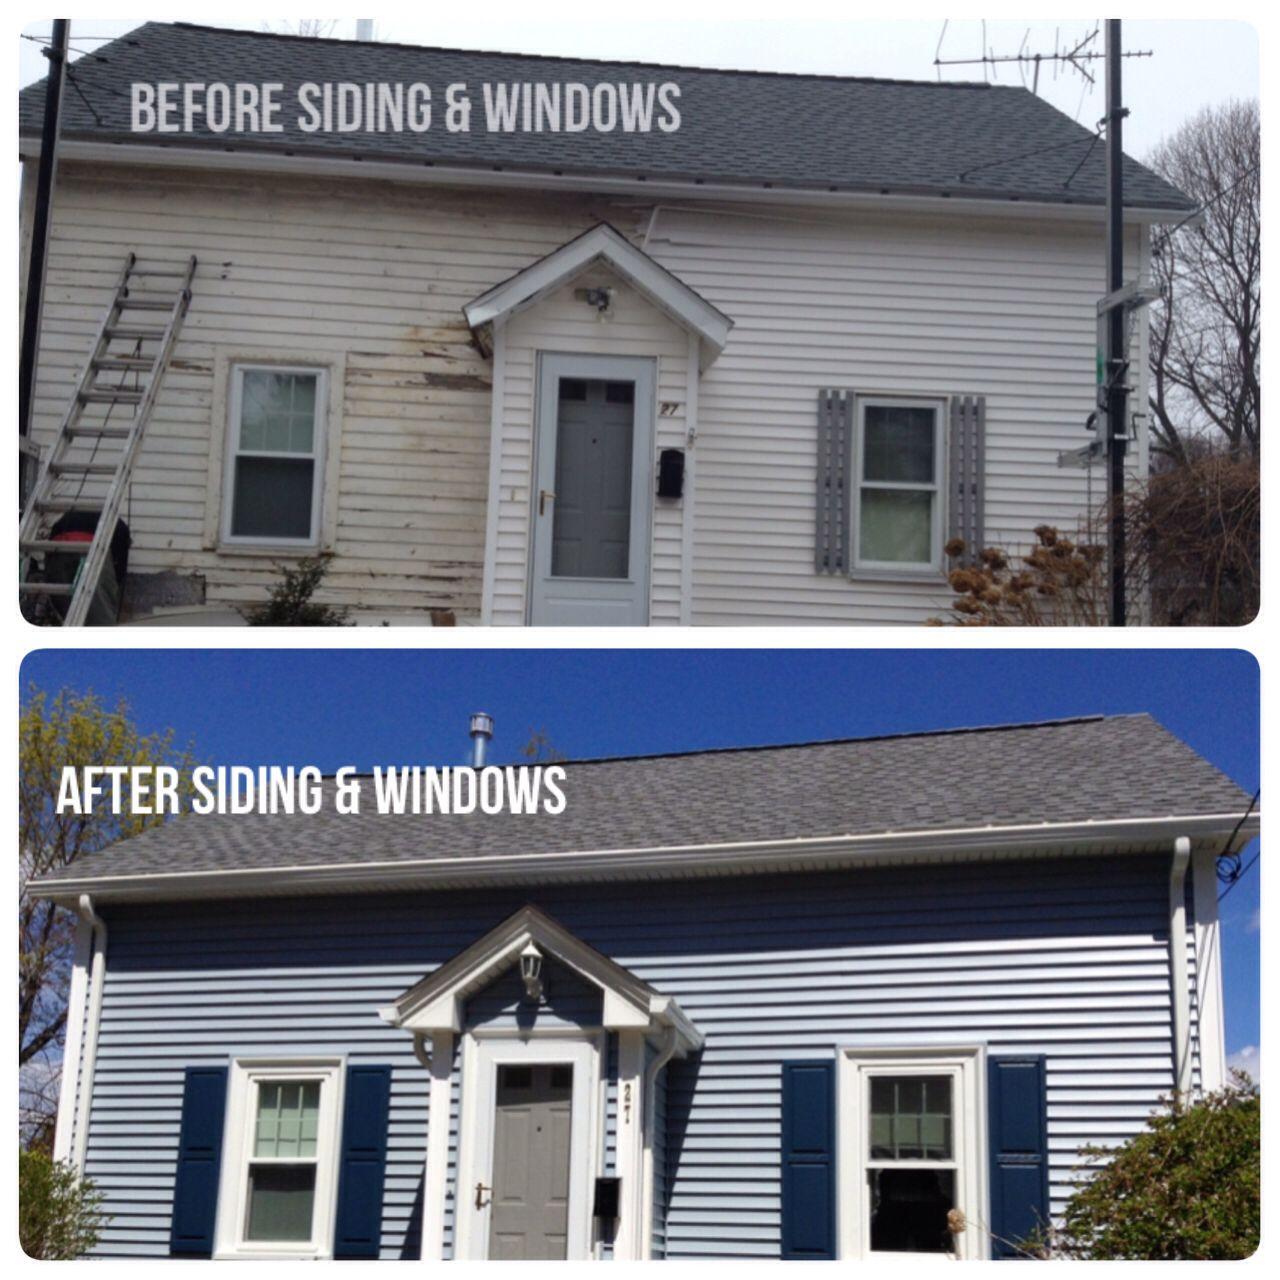 Pin By Brooke Halloran On Three Sons Window Door Inc Harvey Building Products Blue Siding Classic Window